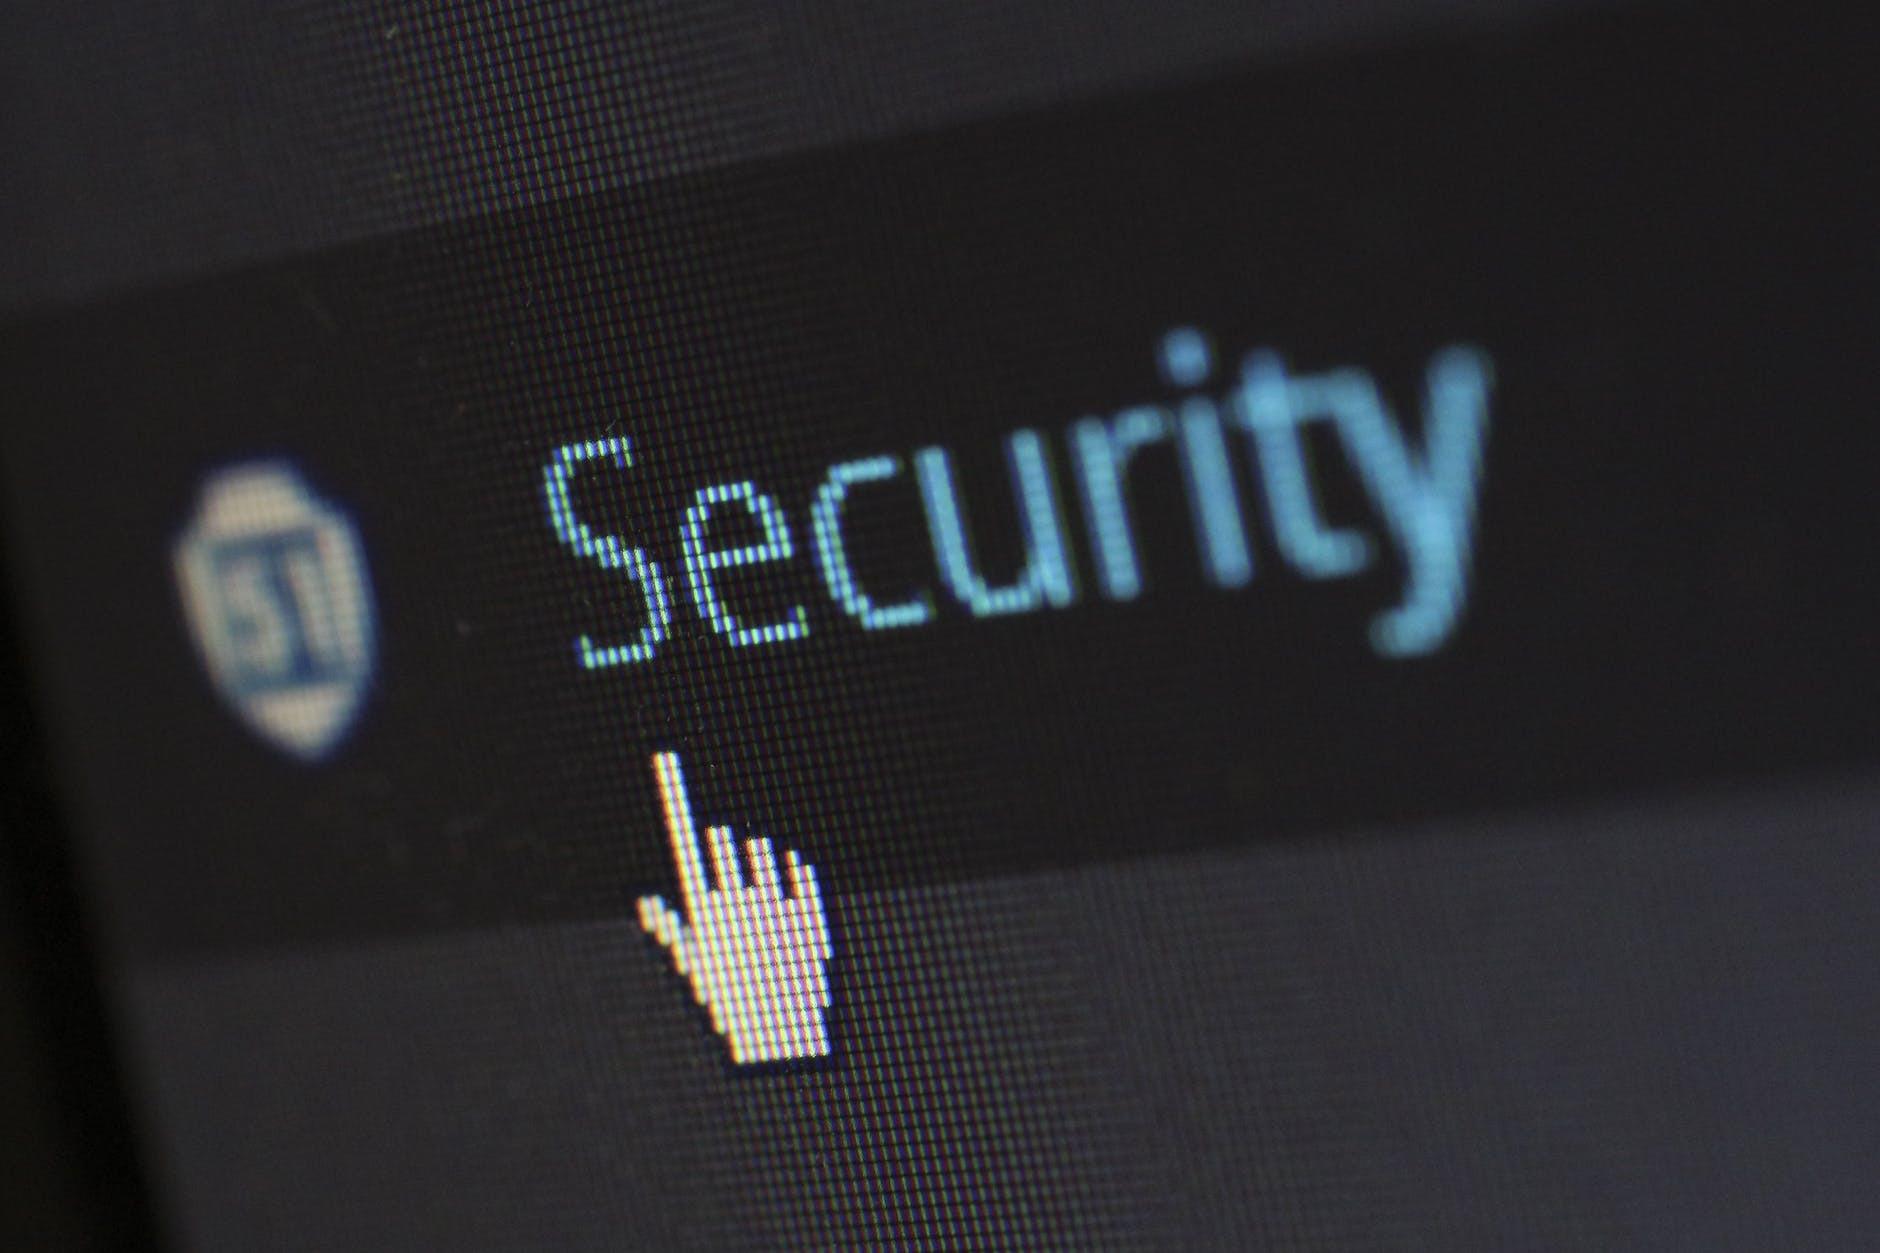 Cybersecurity: l'importanza di mettere al sicuro l'infrastruttura informatica aziendale